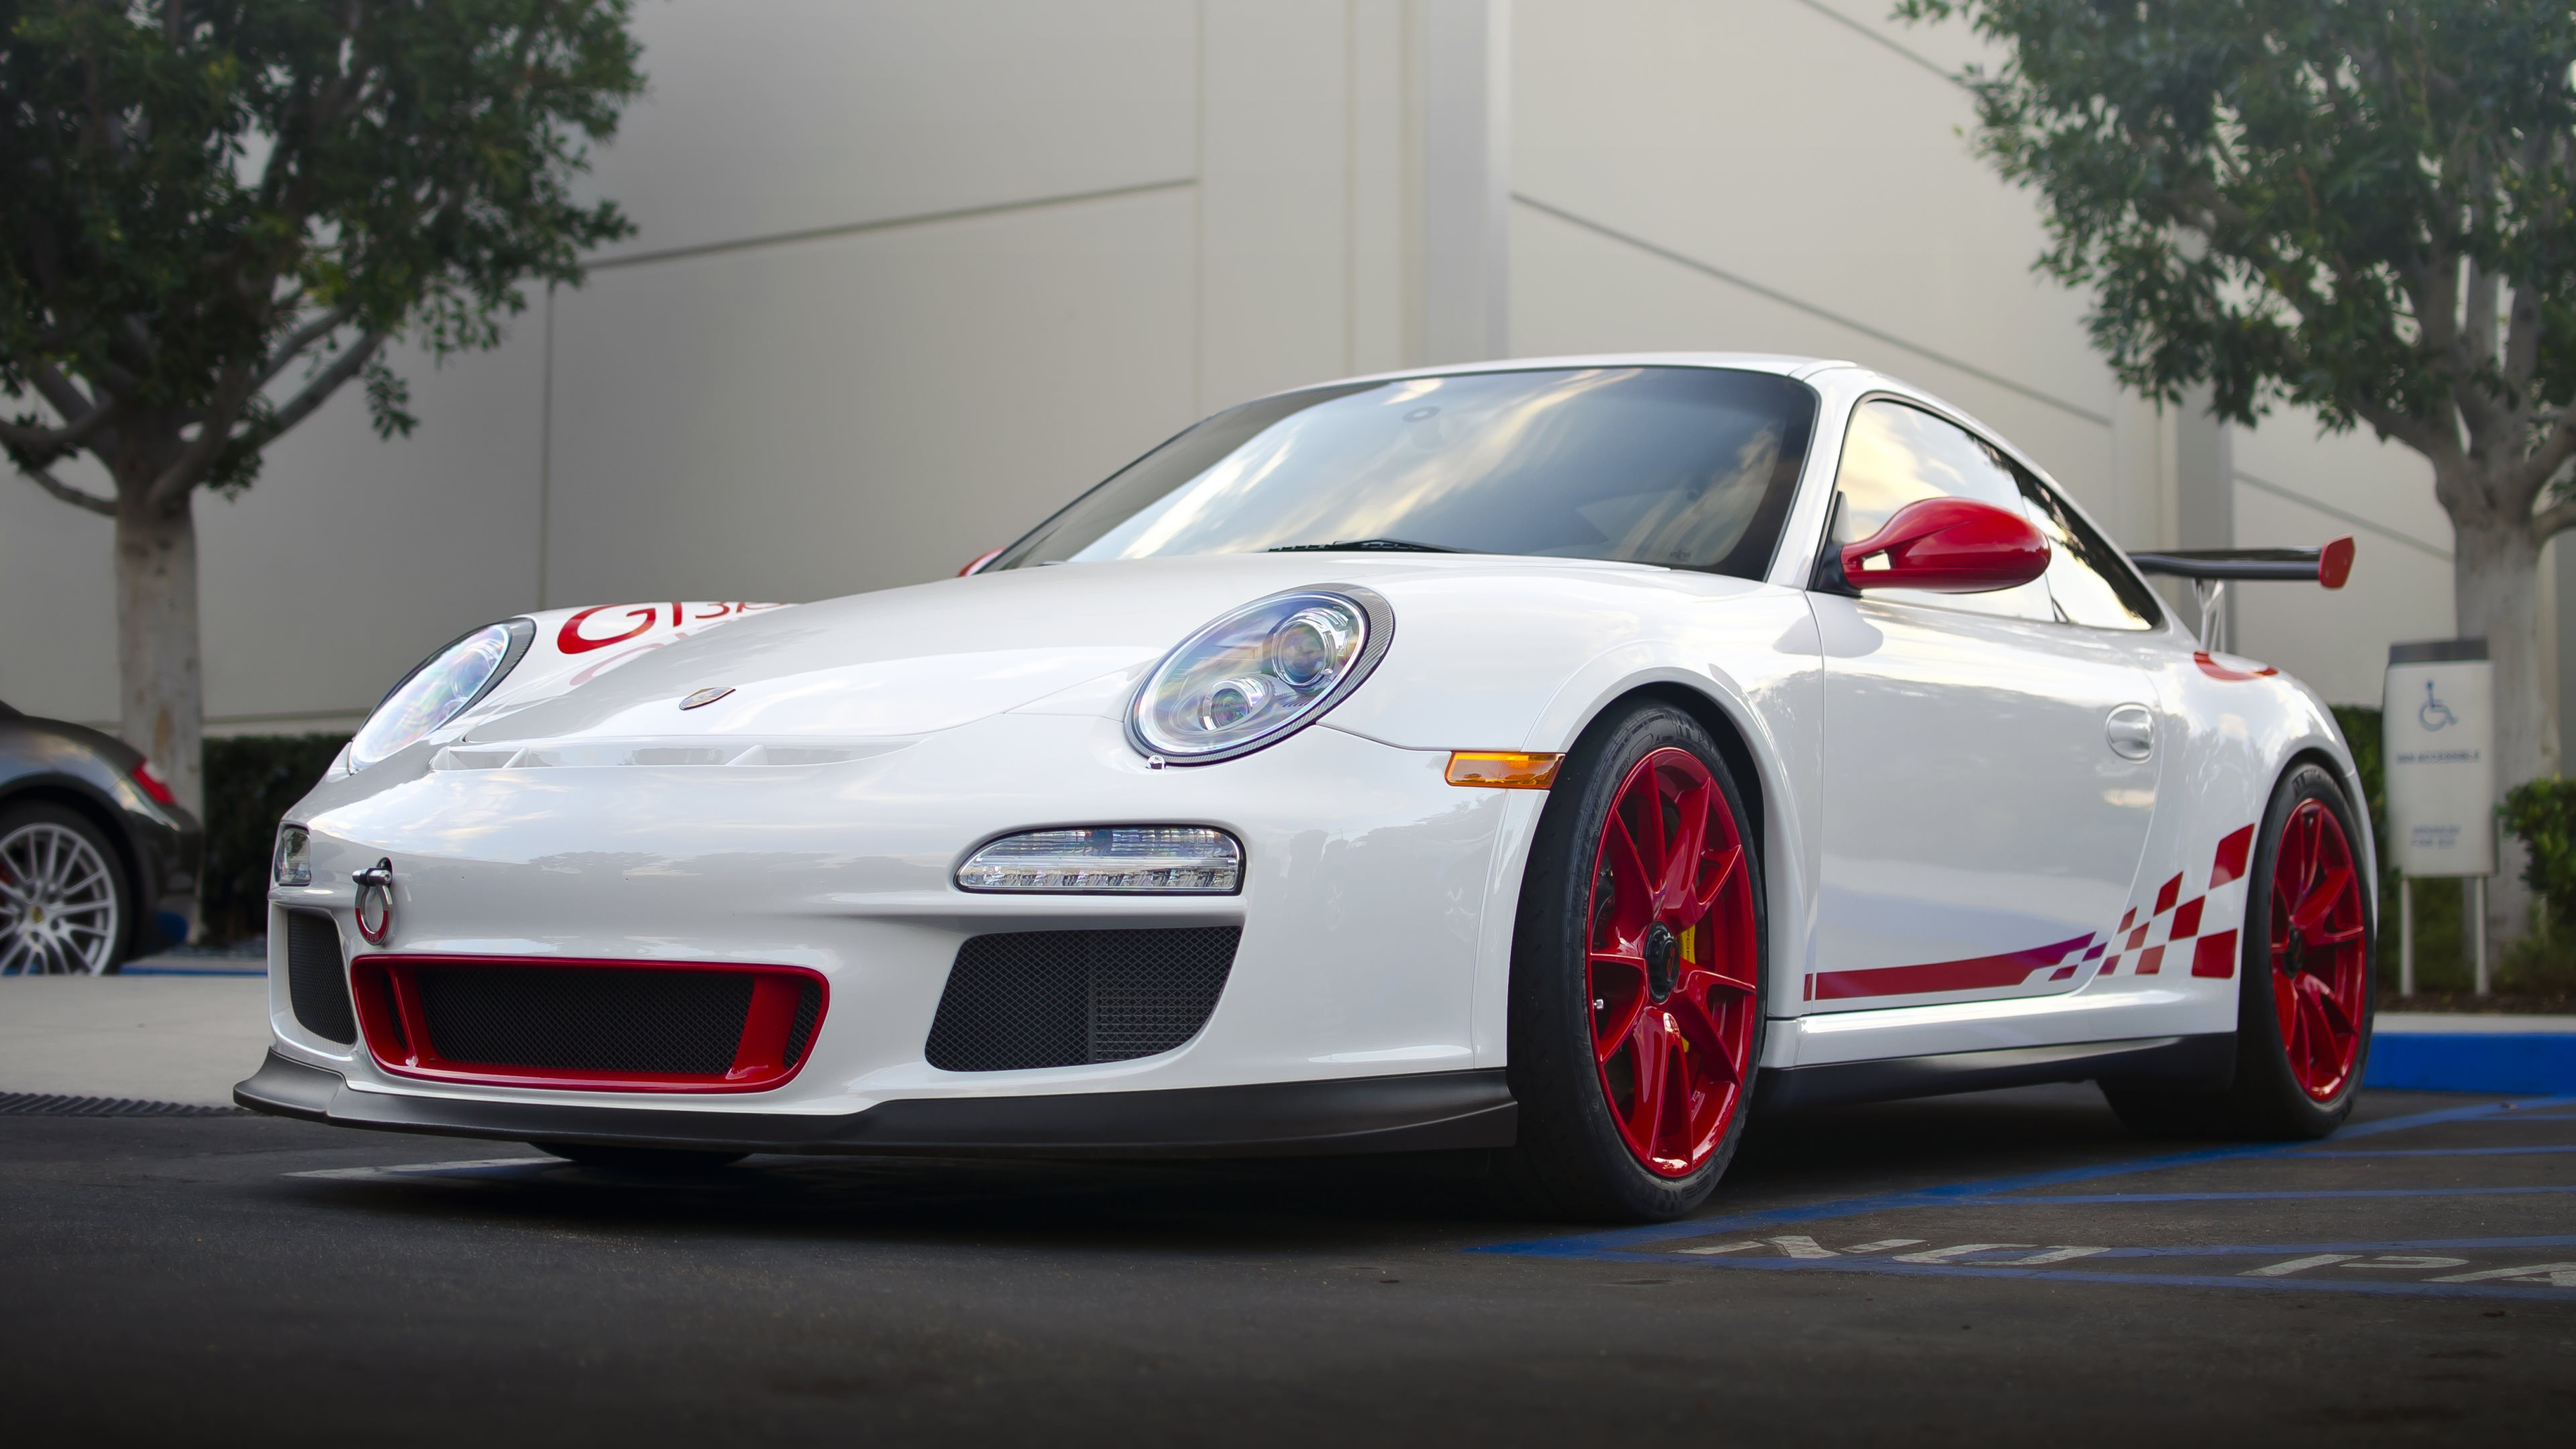 Porsche 911 Wallpapers Pictures Images 3840x2160